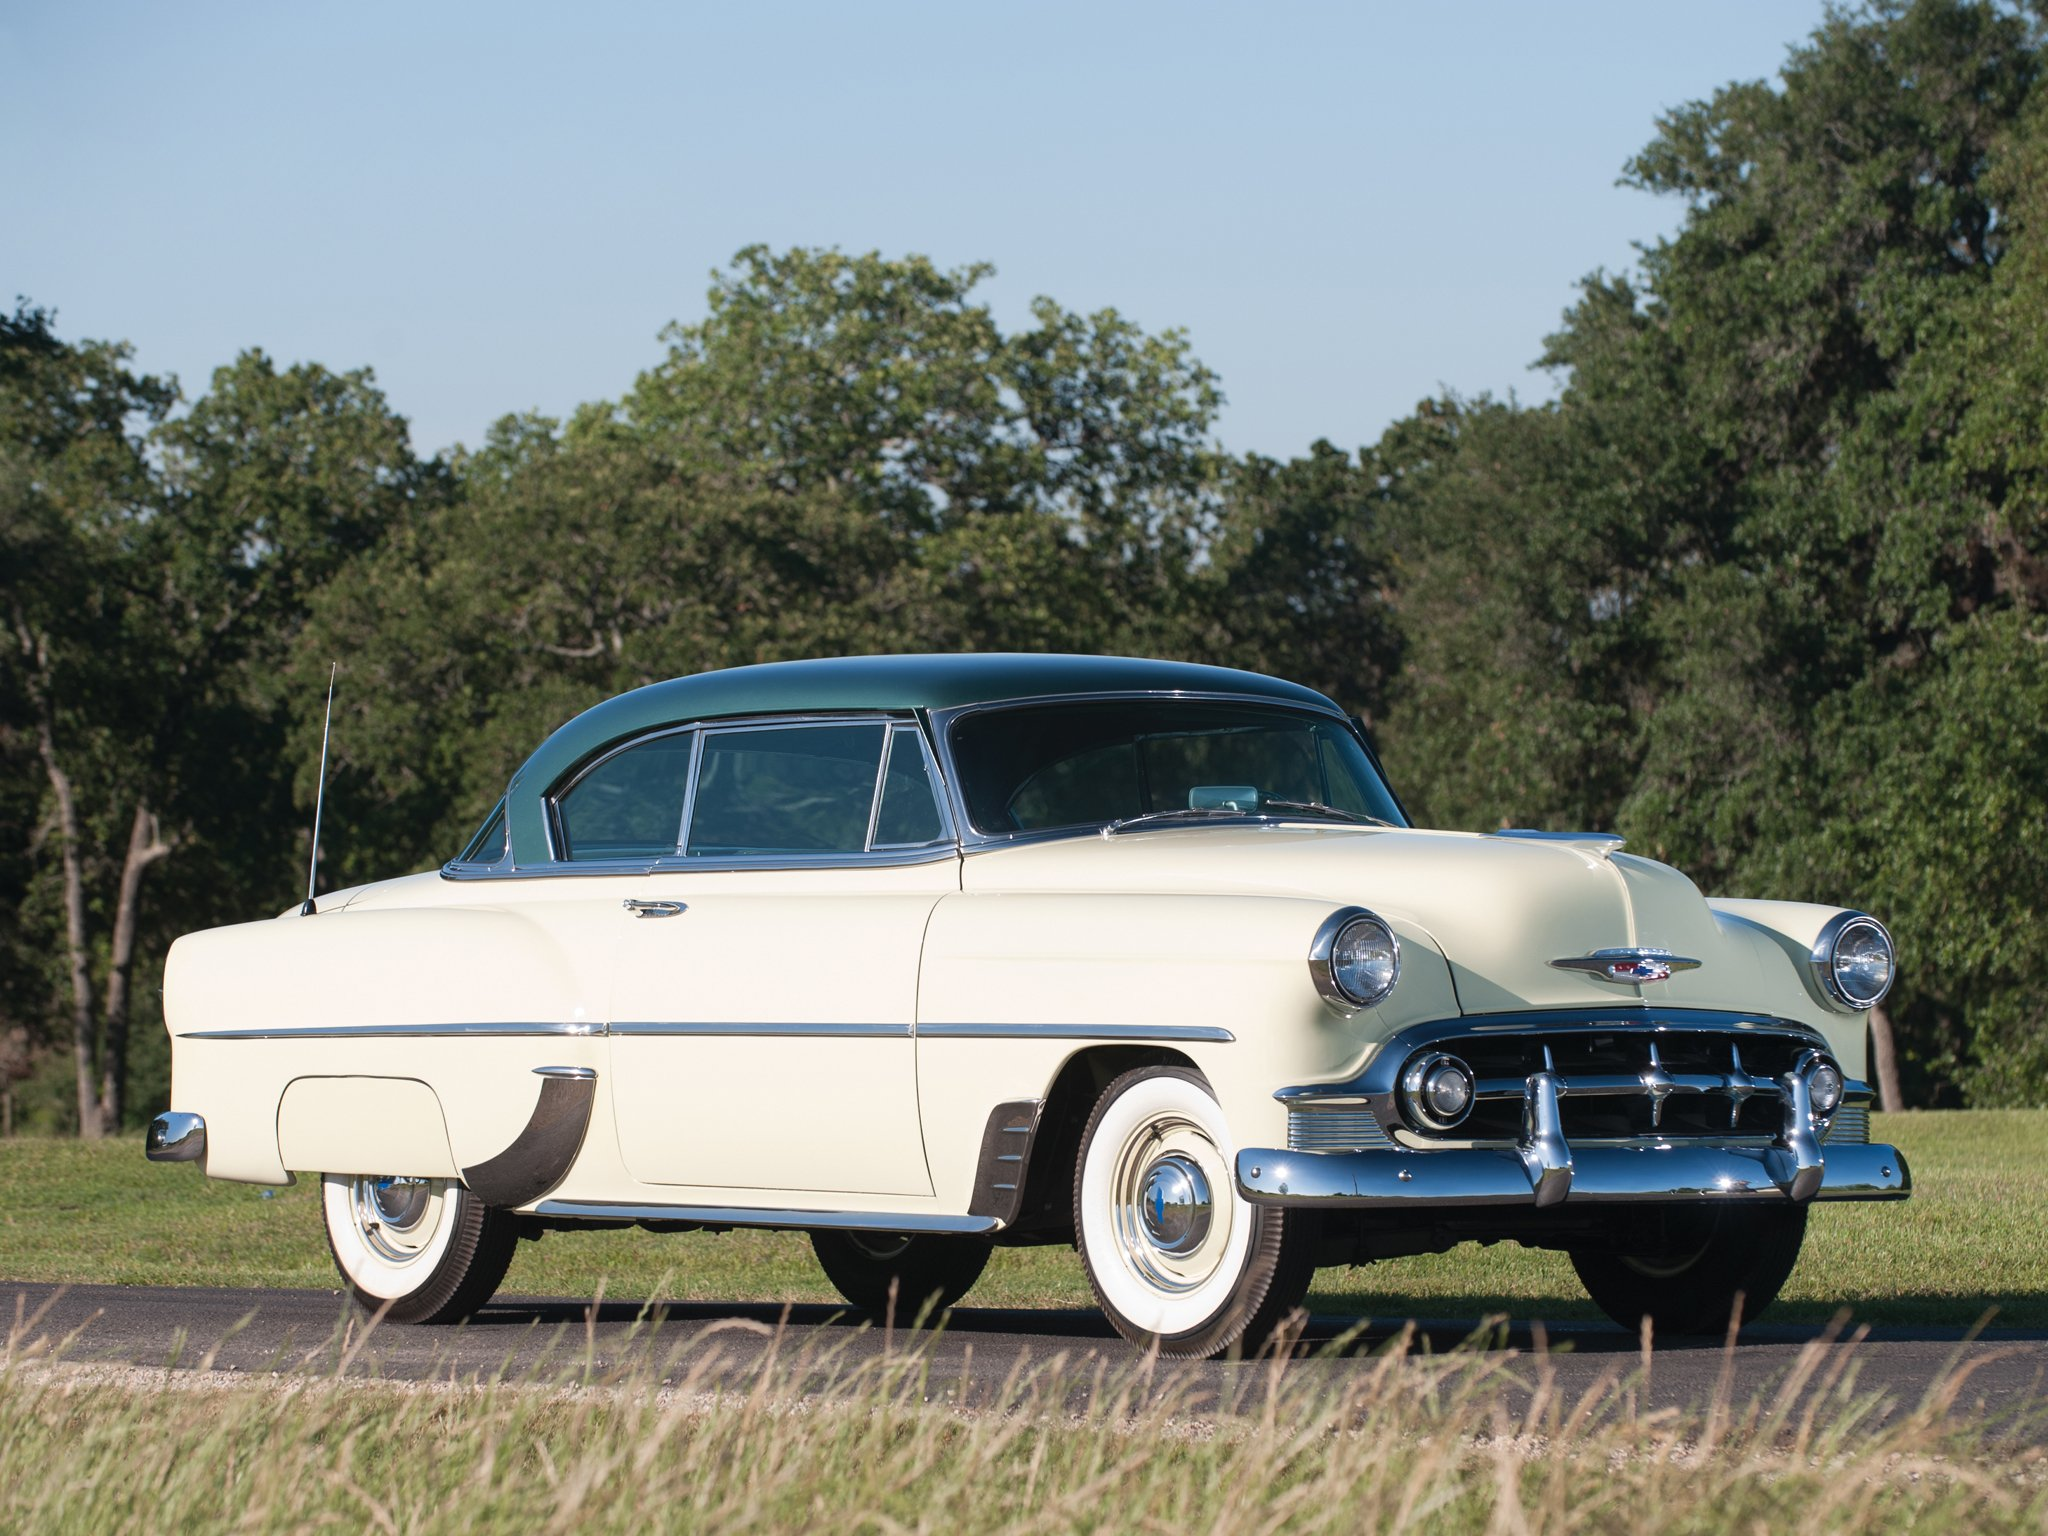 1953 Chevrolet DeLuxe 210 Sport Coupe (B-2154-1037) retro (1 ...